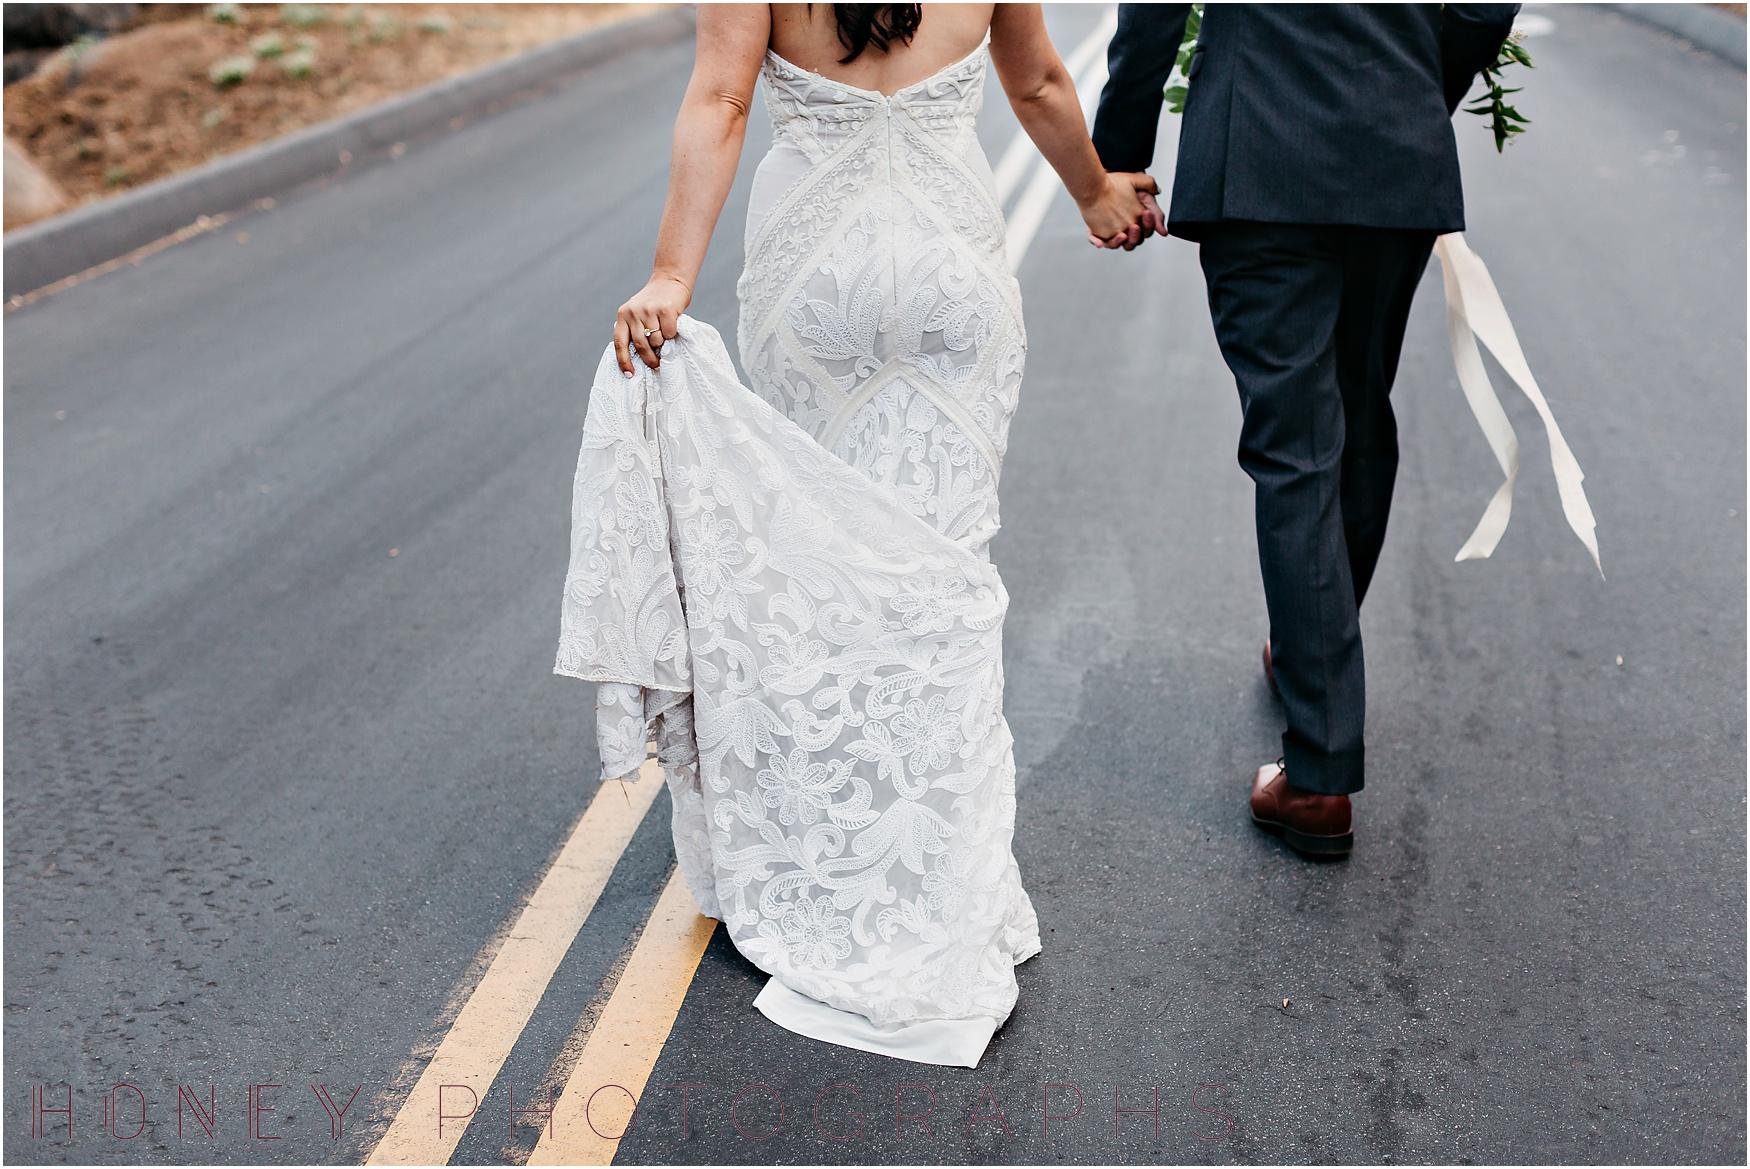 picnic-wedding-rustic-sweetheart-table-felicita-park-boho17.jpg